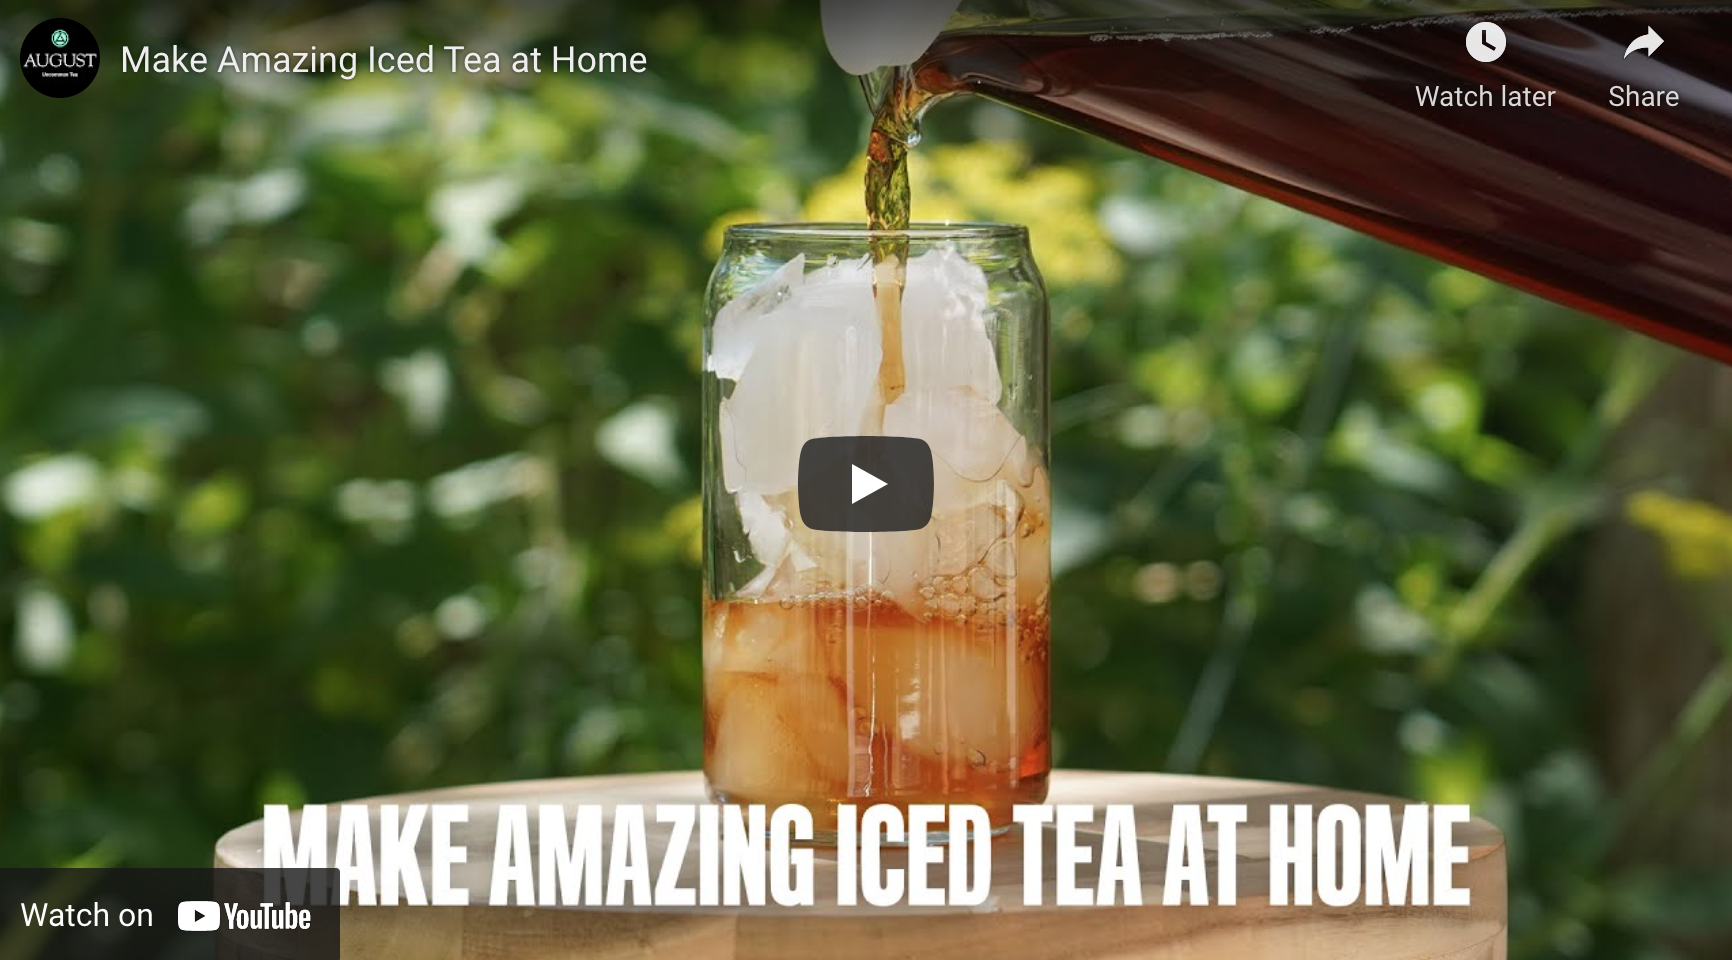 Make Amazing Iced Tea